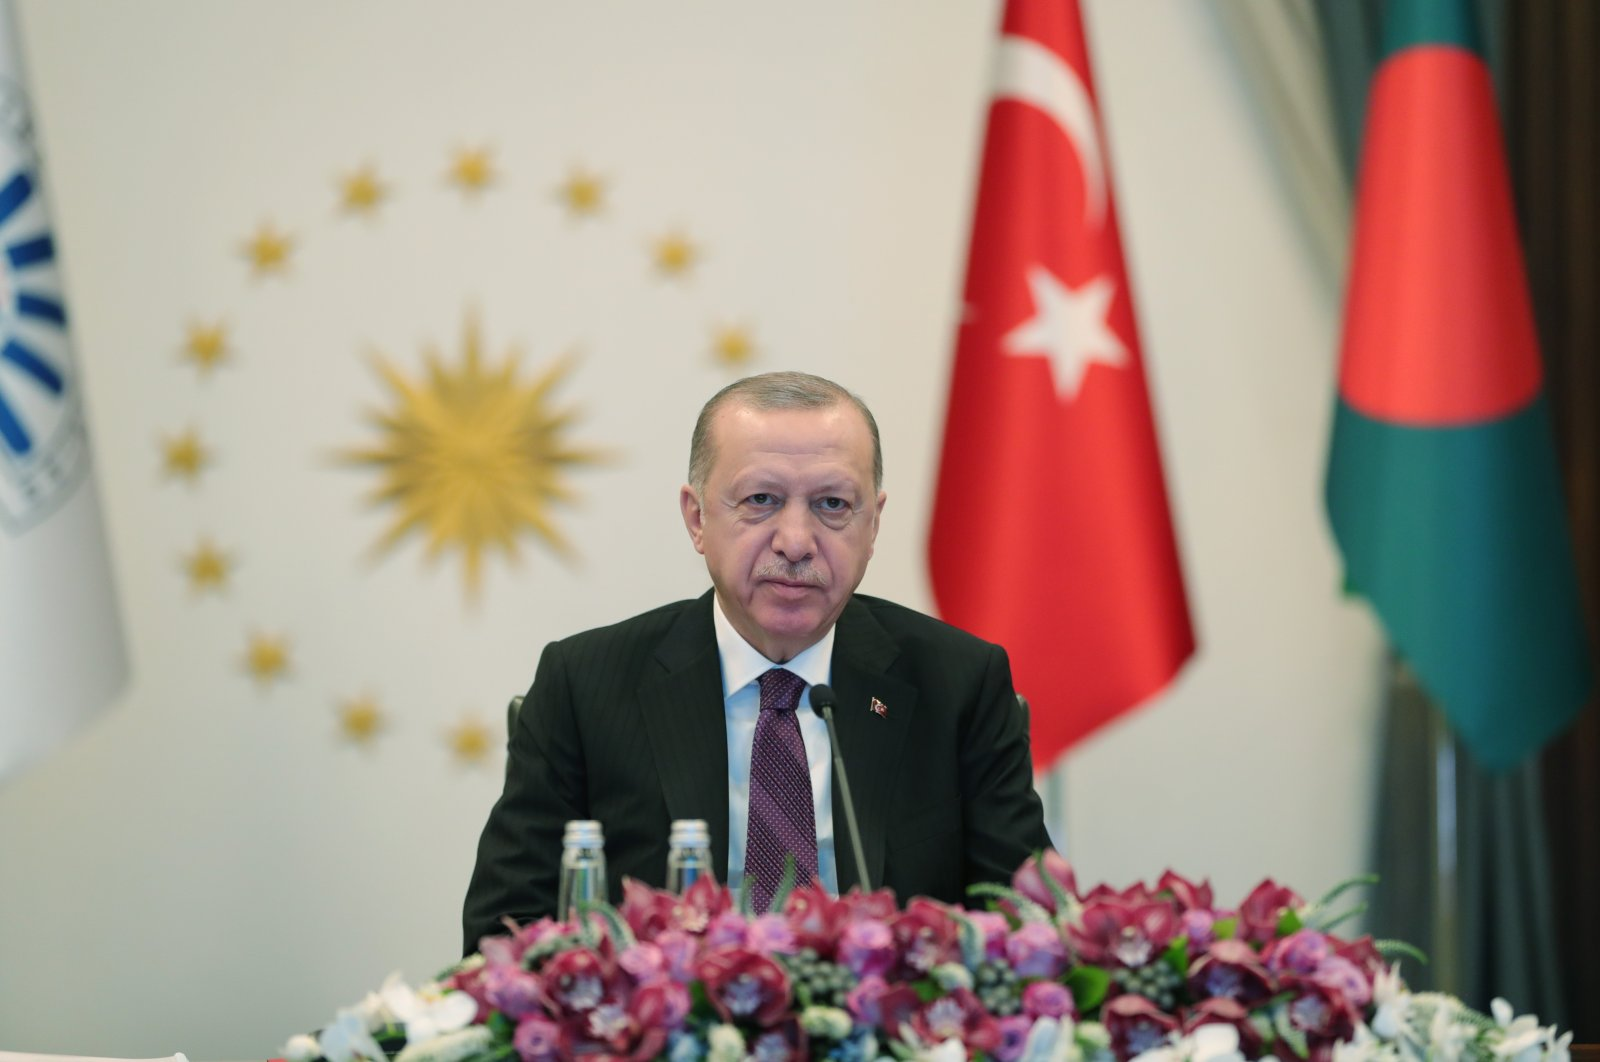 President Recep Tayyip Erdoğan addresses the virtual D-8 Organization for Economic Cooperation Summit, Ankara, Turkey, April 8, 2021. (AA Photo)